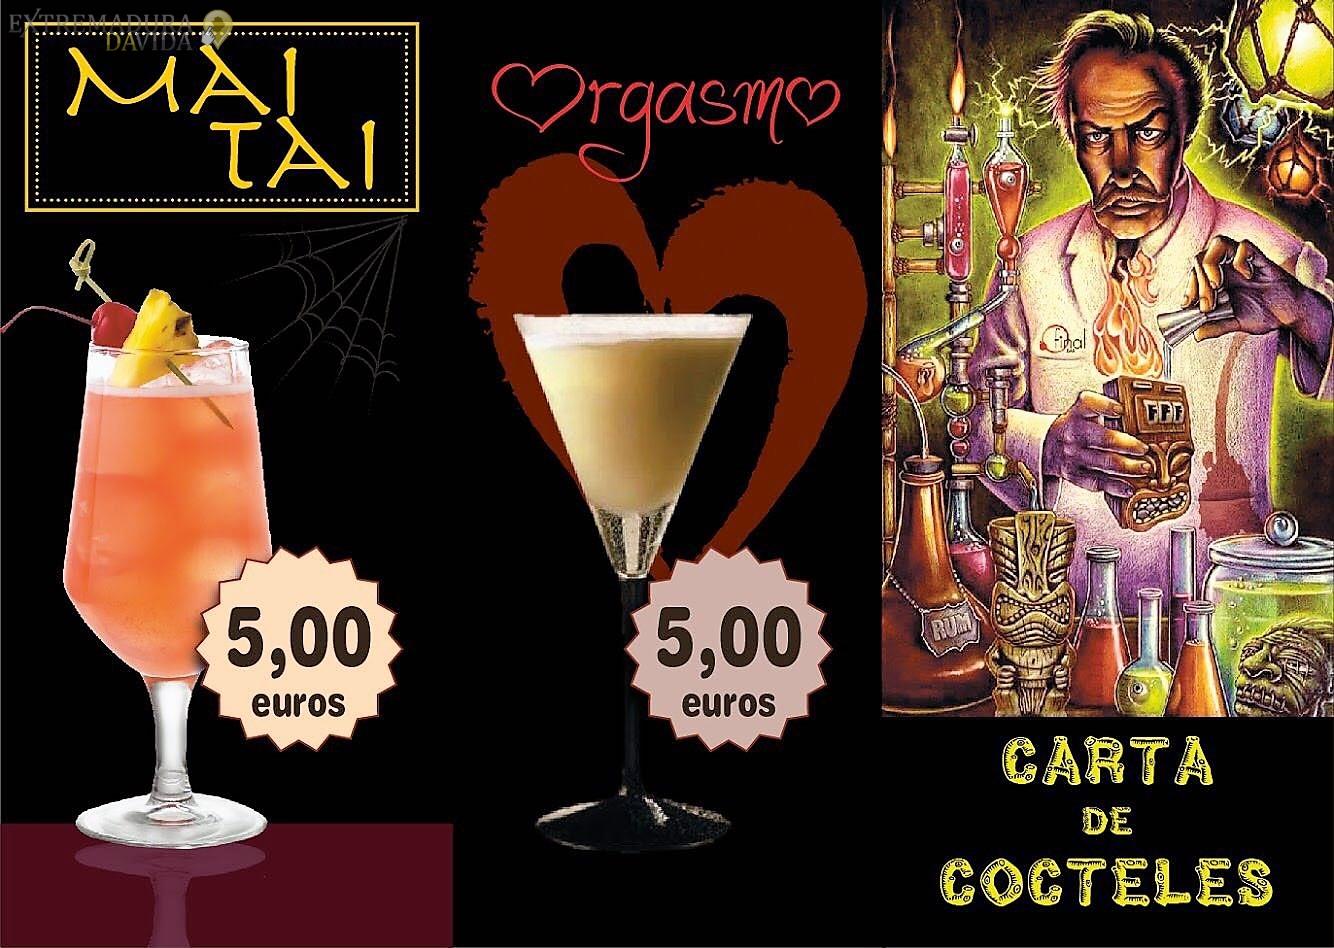 Bar Café Cocteleria en Navalmoral de la Mata - Final